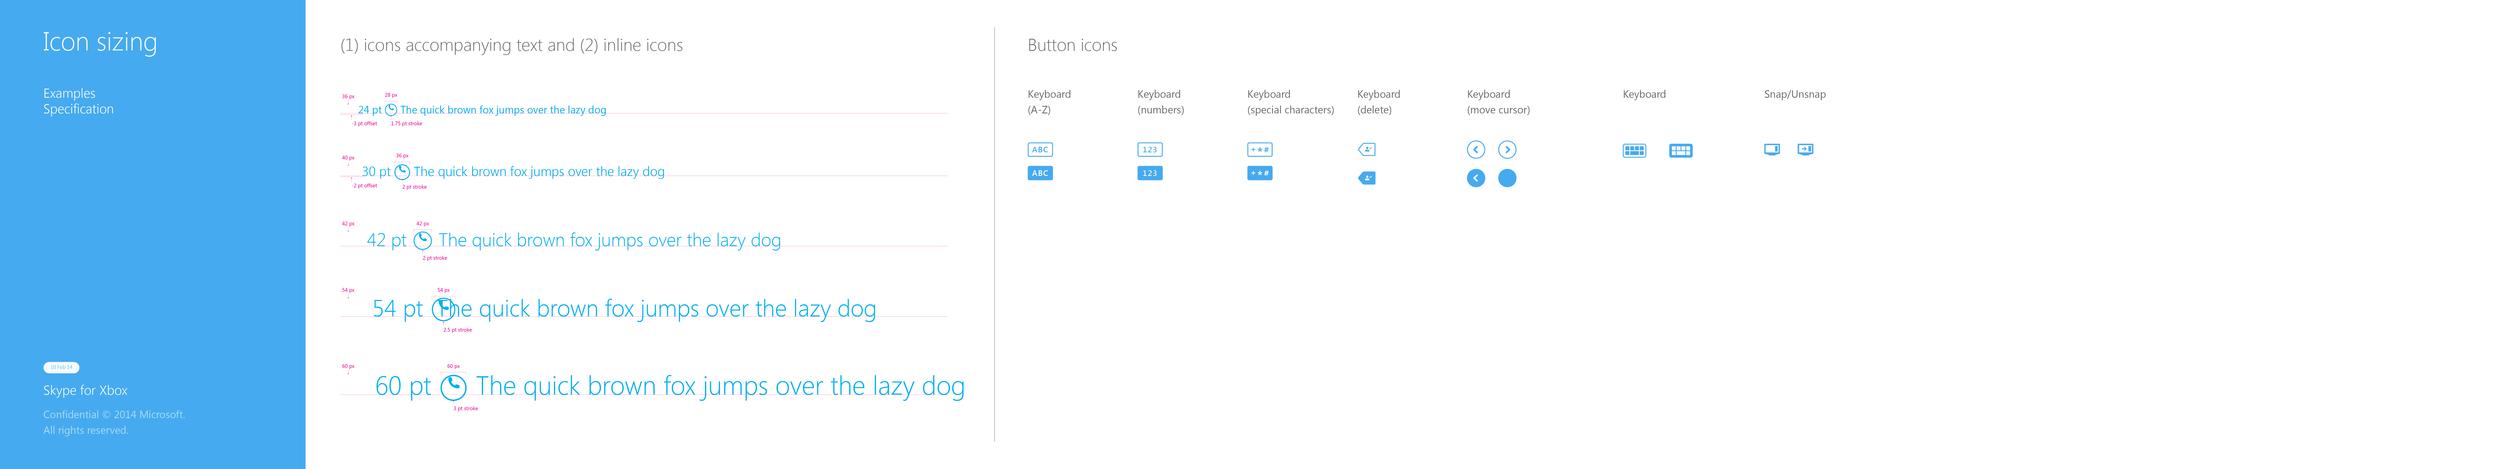 GUI kit_icon sizes.png